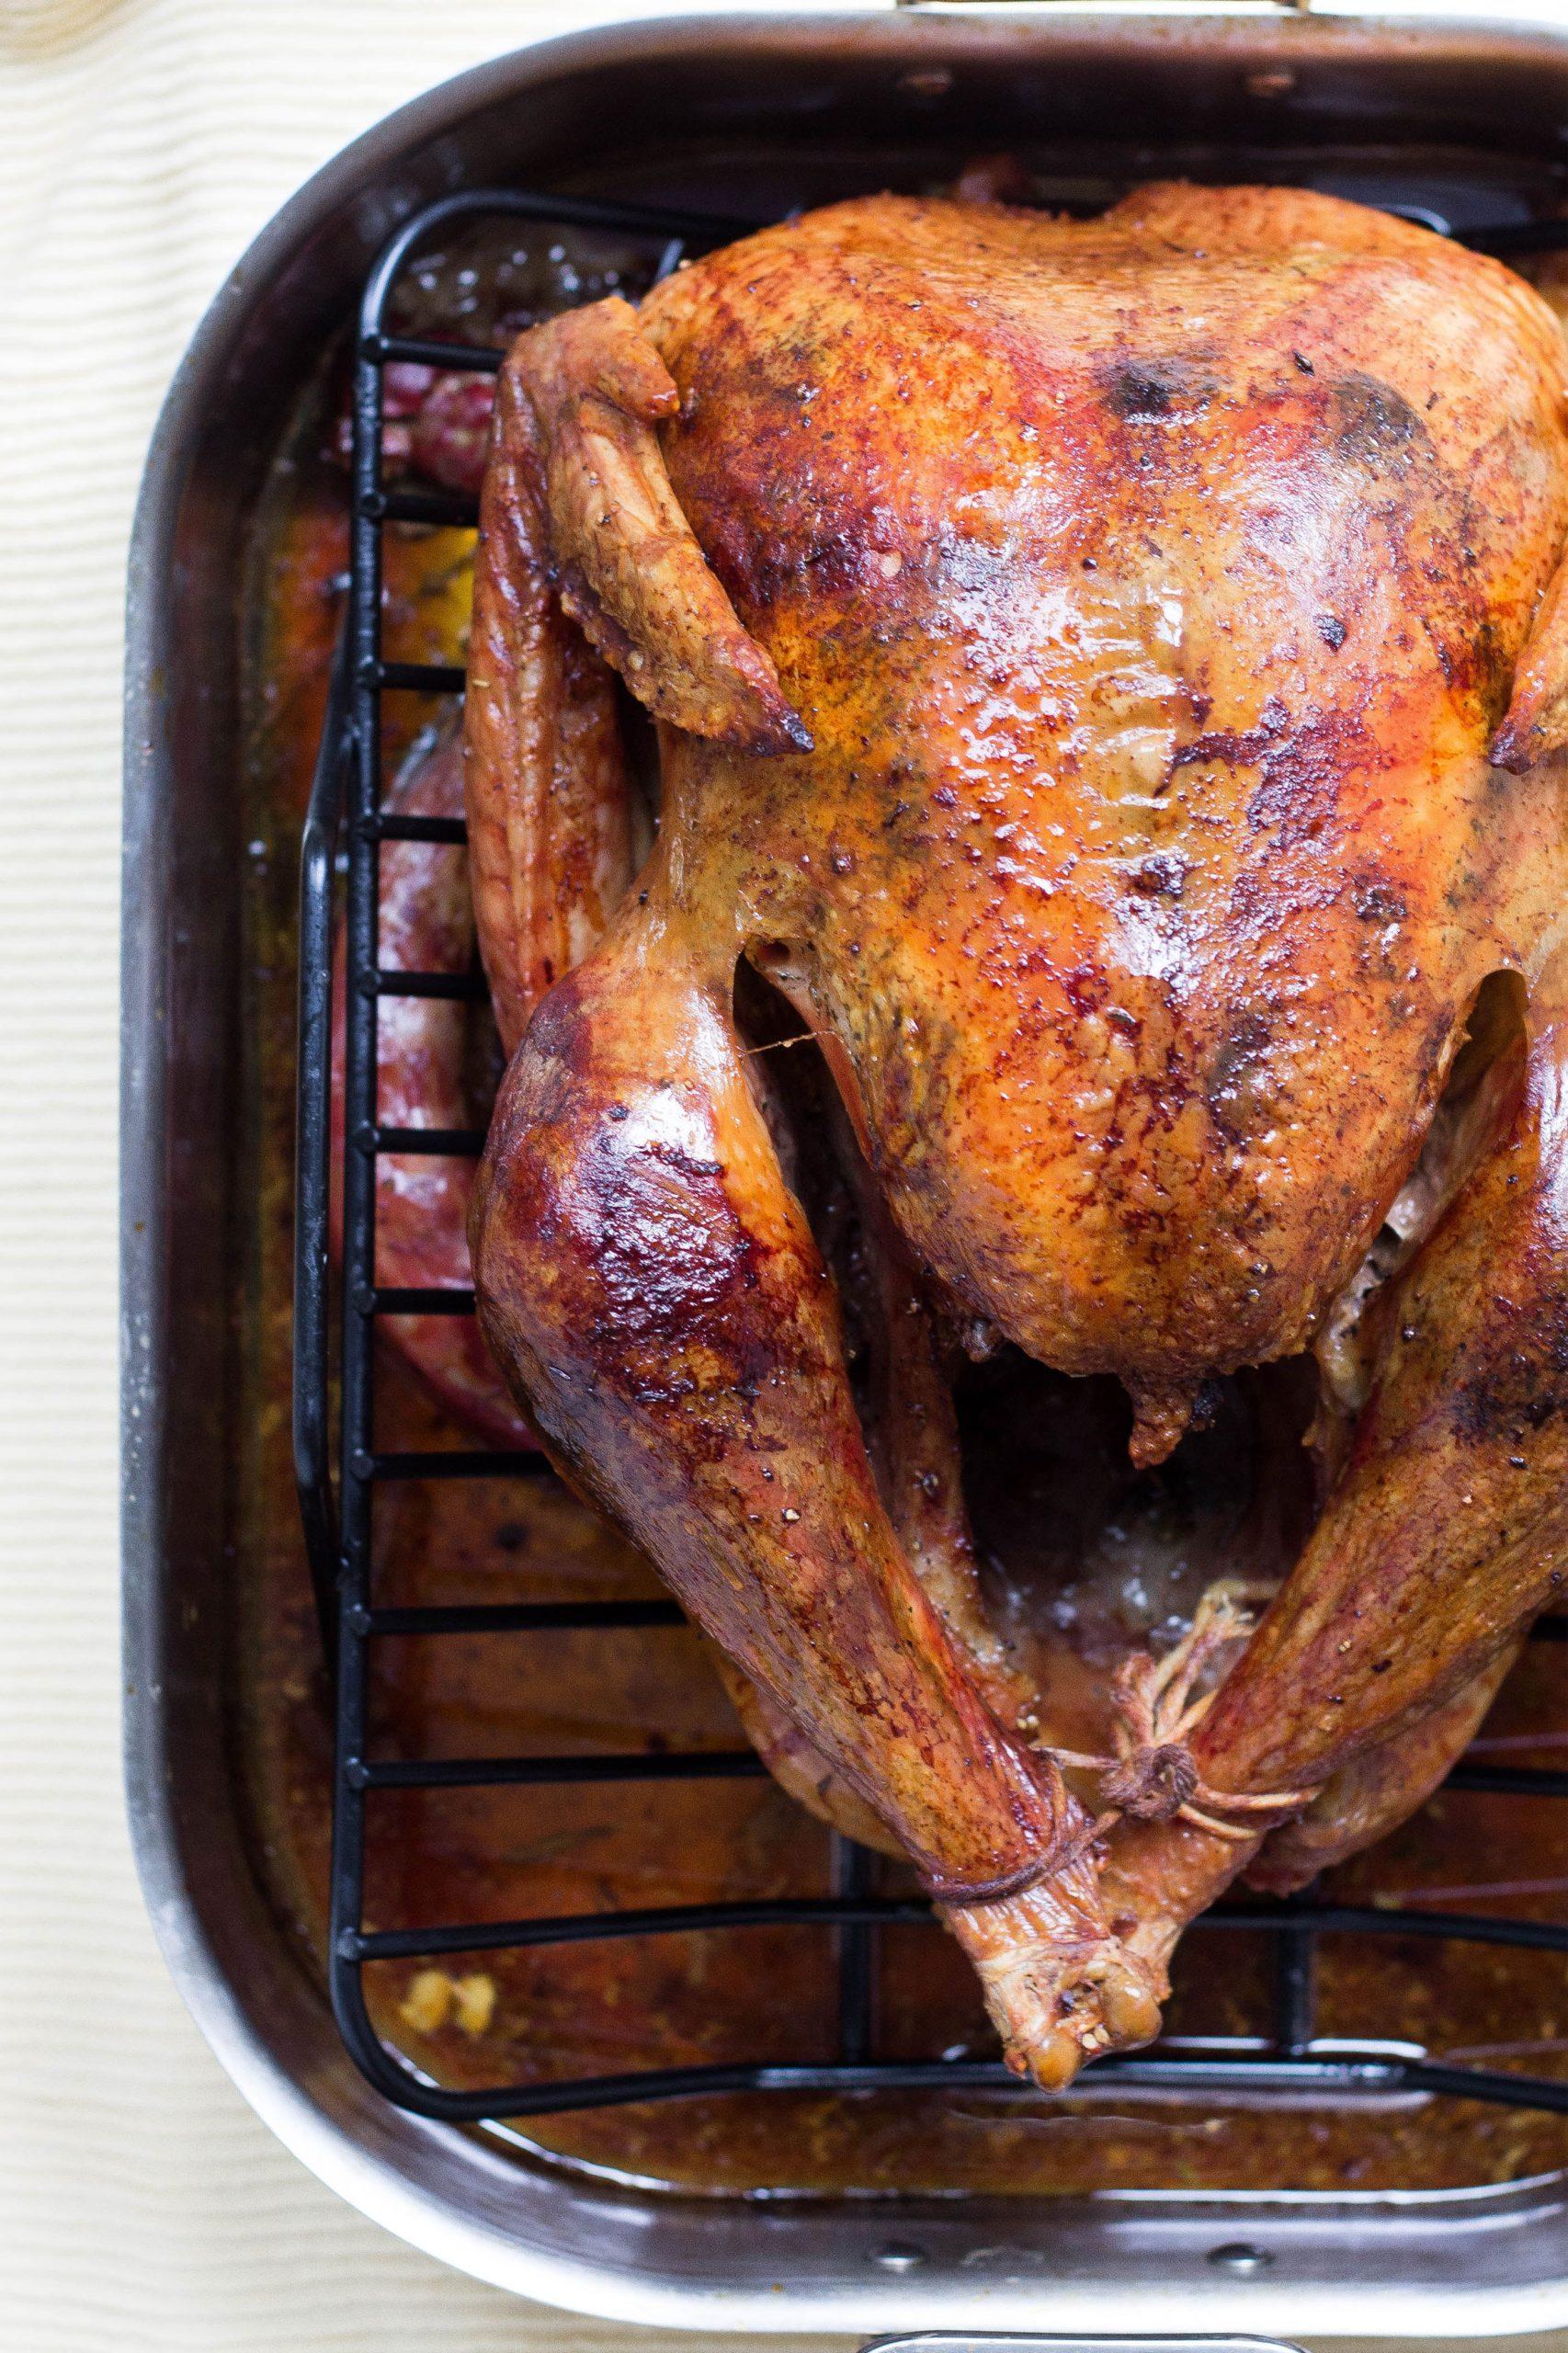 Enjoy turkey on Thanksgiving!